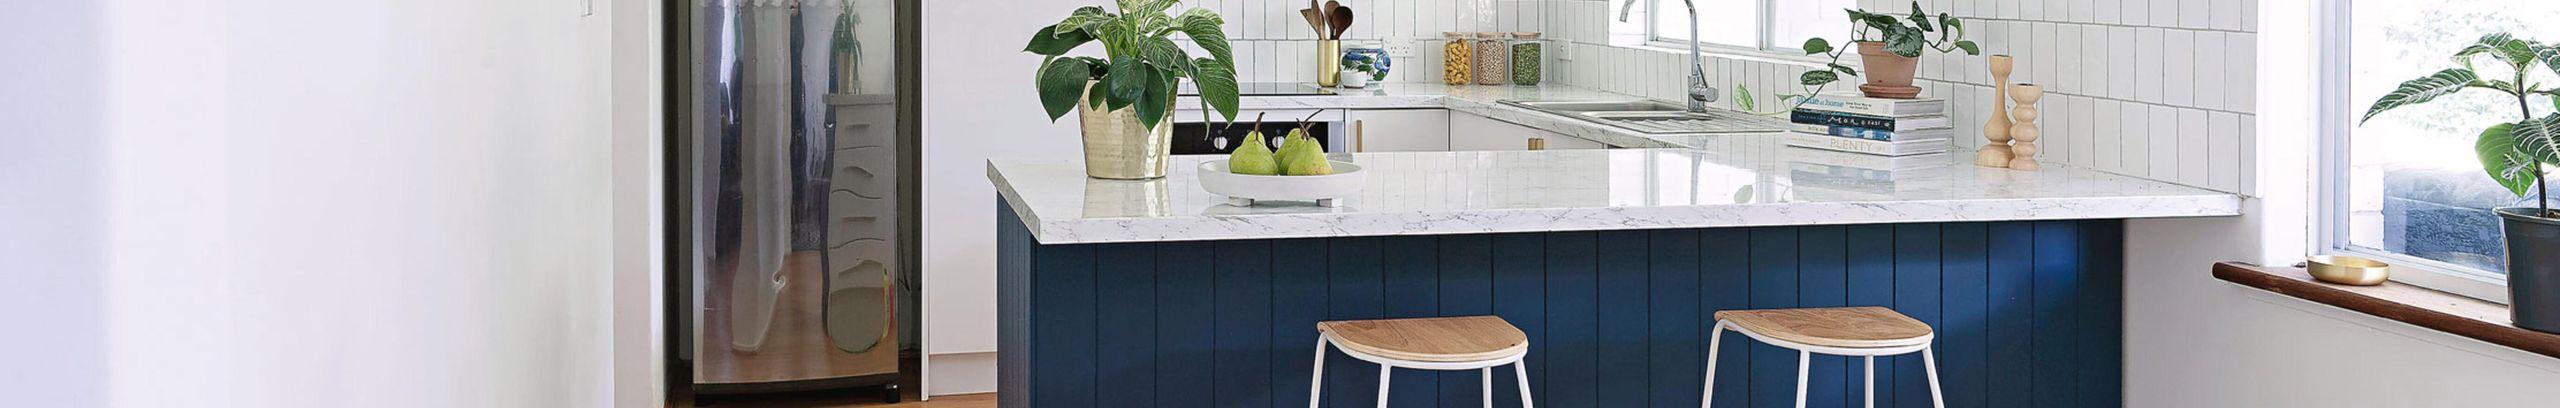 Modern kitchen with white stone benchtop